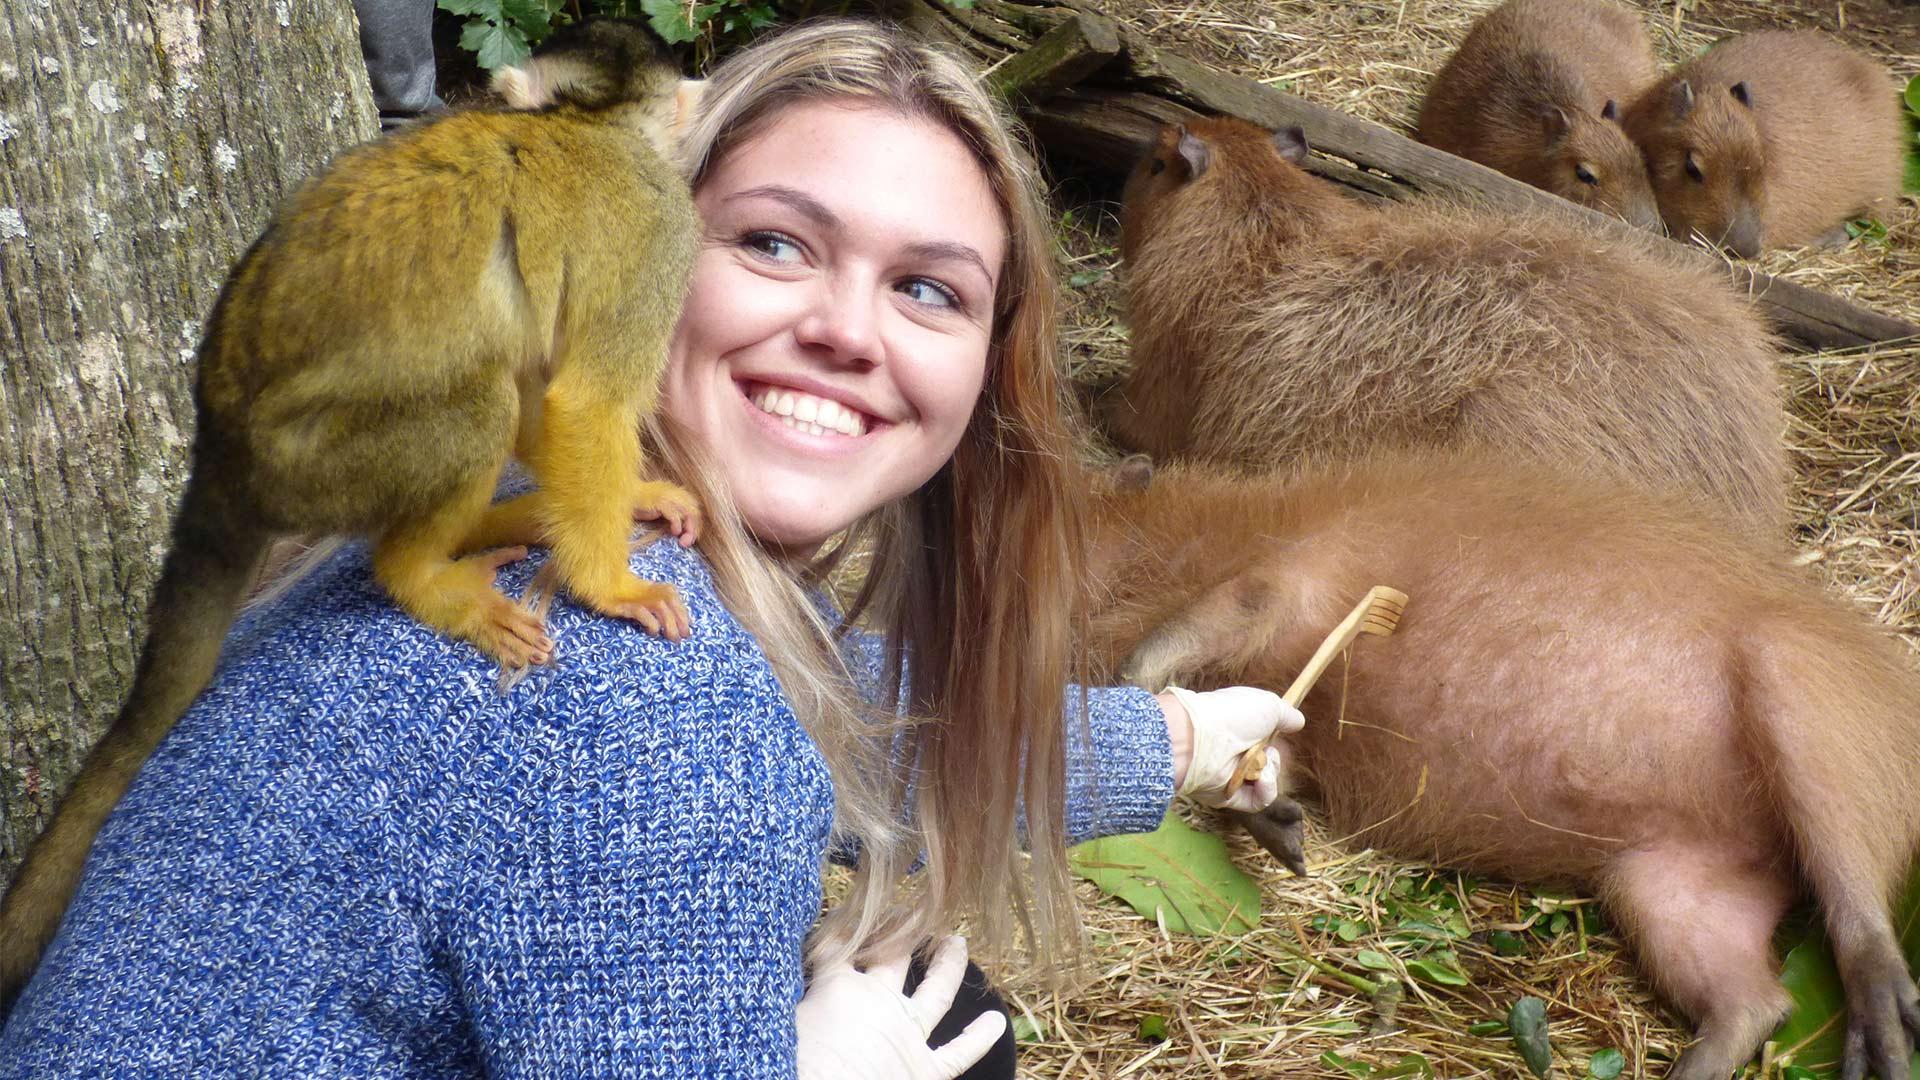 https://rfacdn.nz/zoo/assets/media/capybara-squirrel-monkey-experience-gallery.jpg